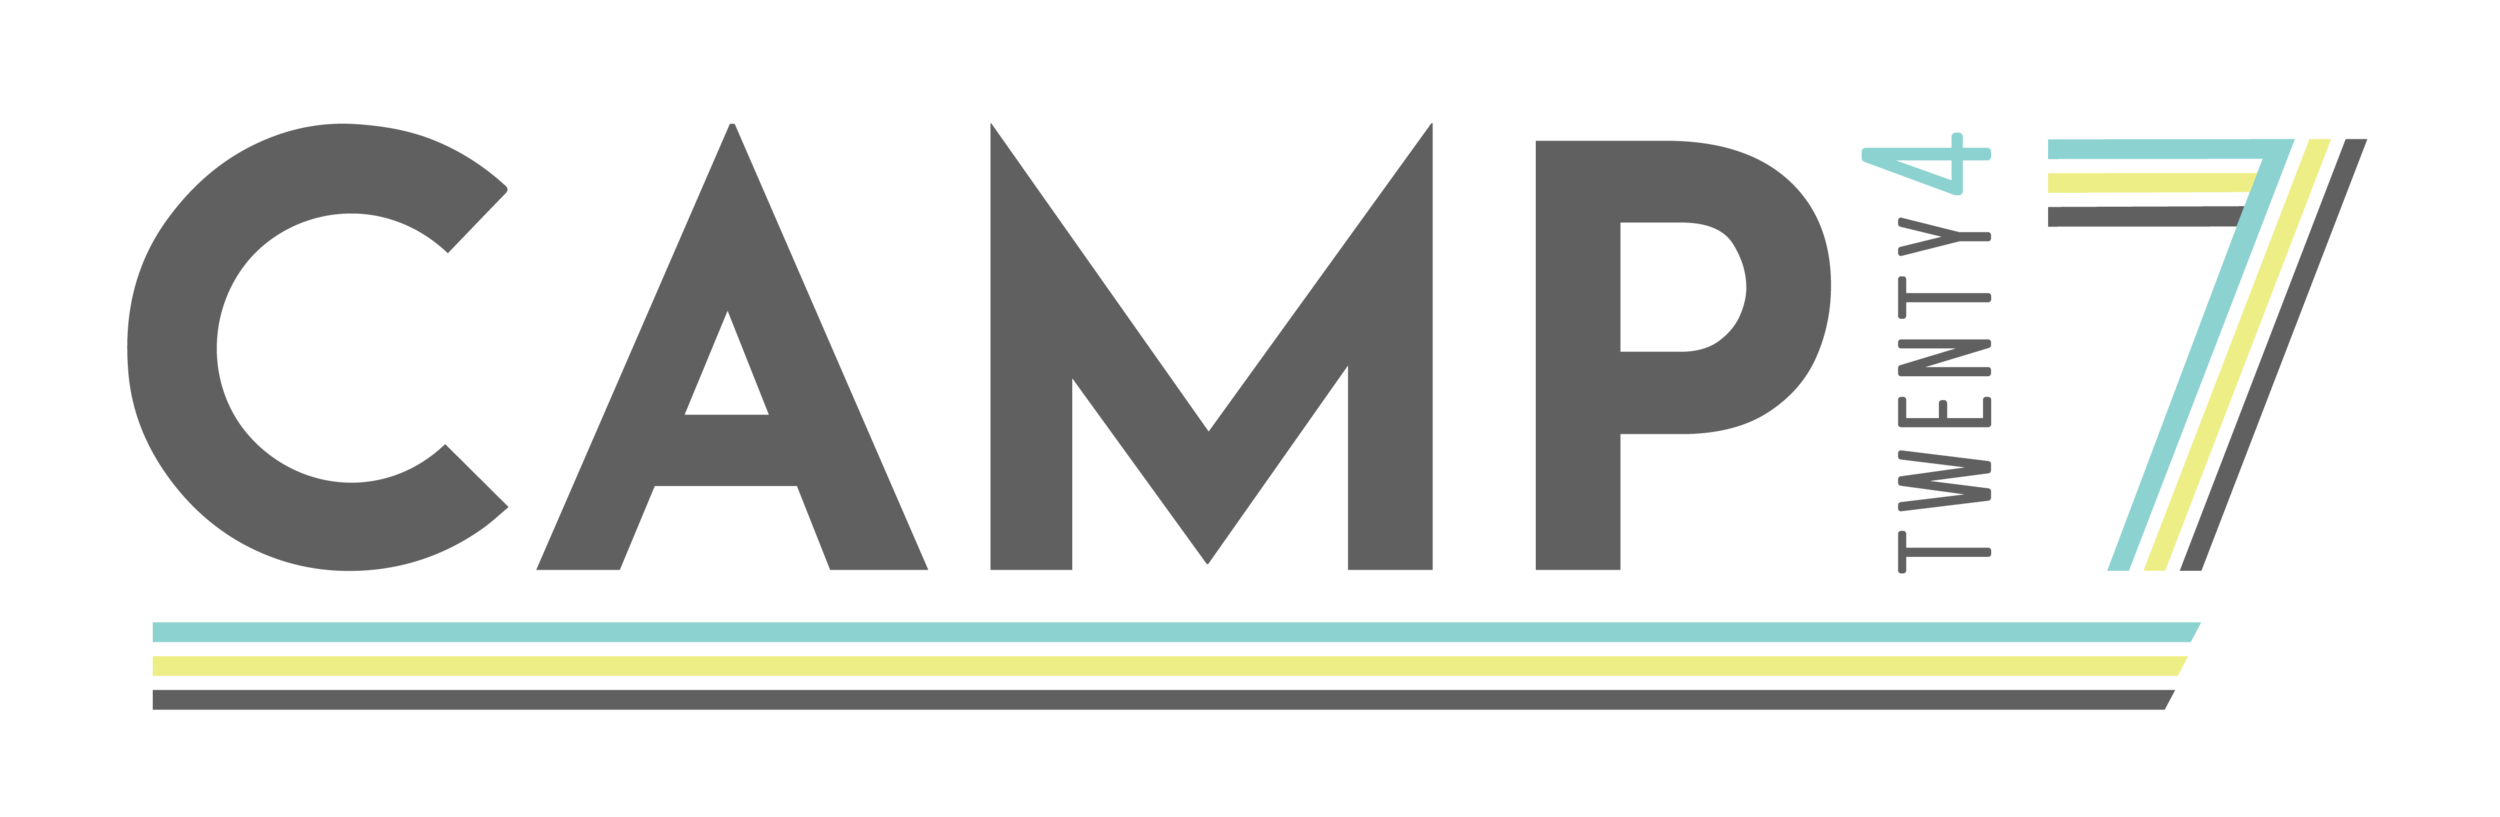 Main-Logo-01.png